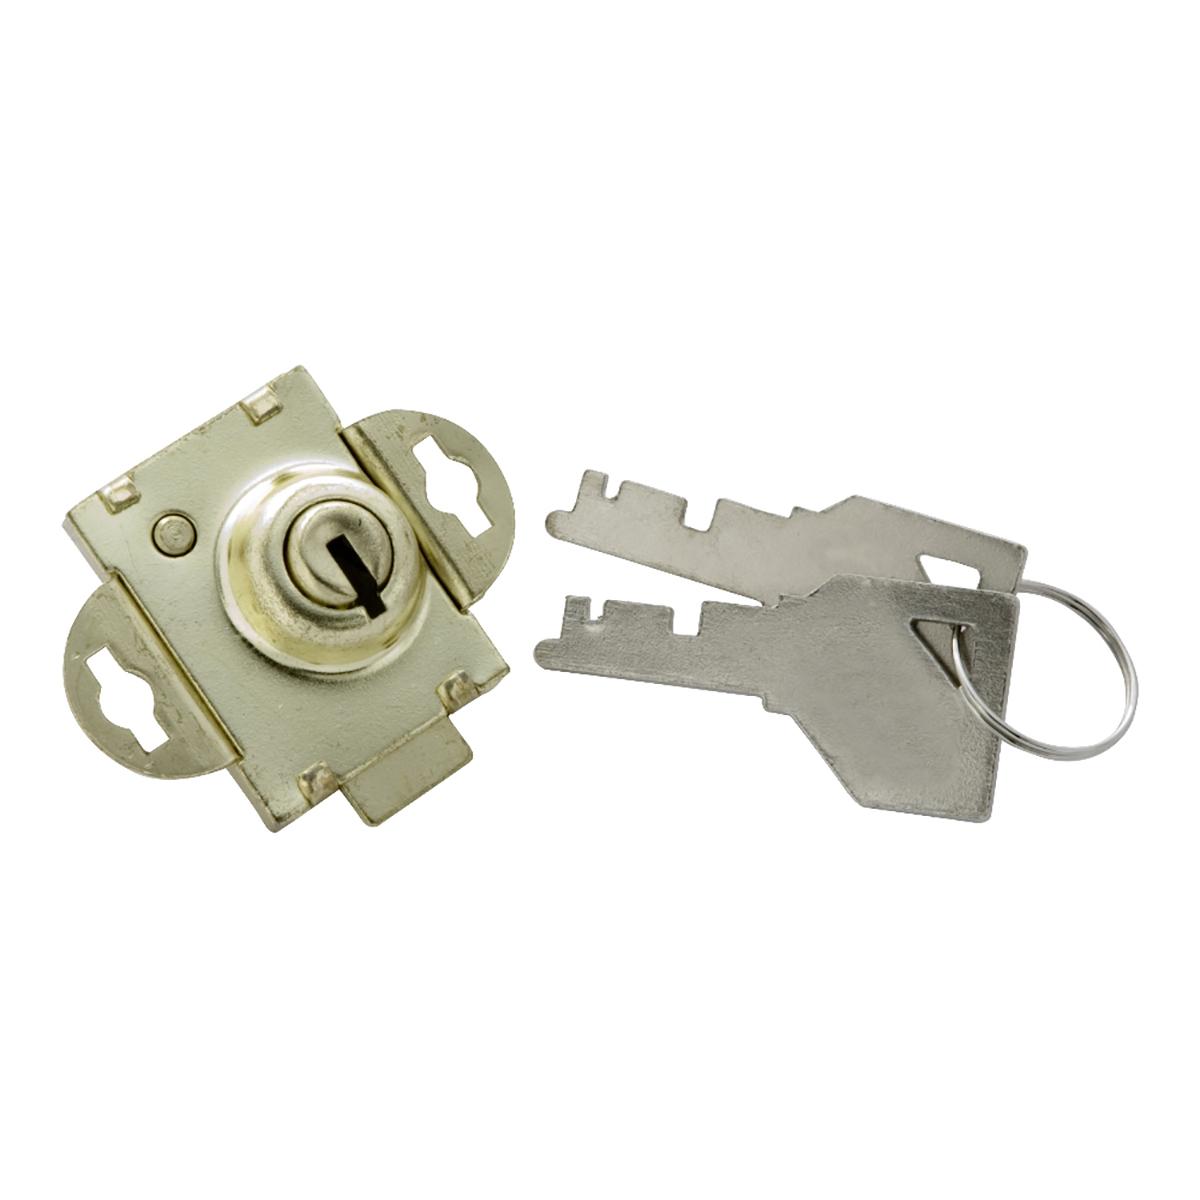 Mailbox Lock First Watch Security